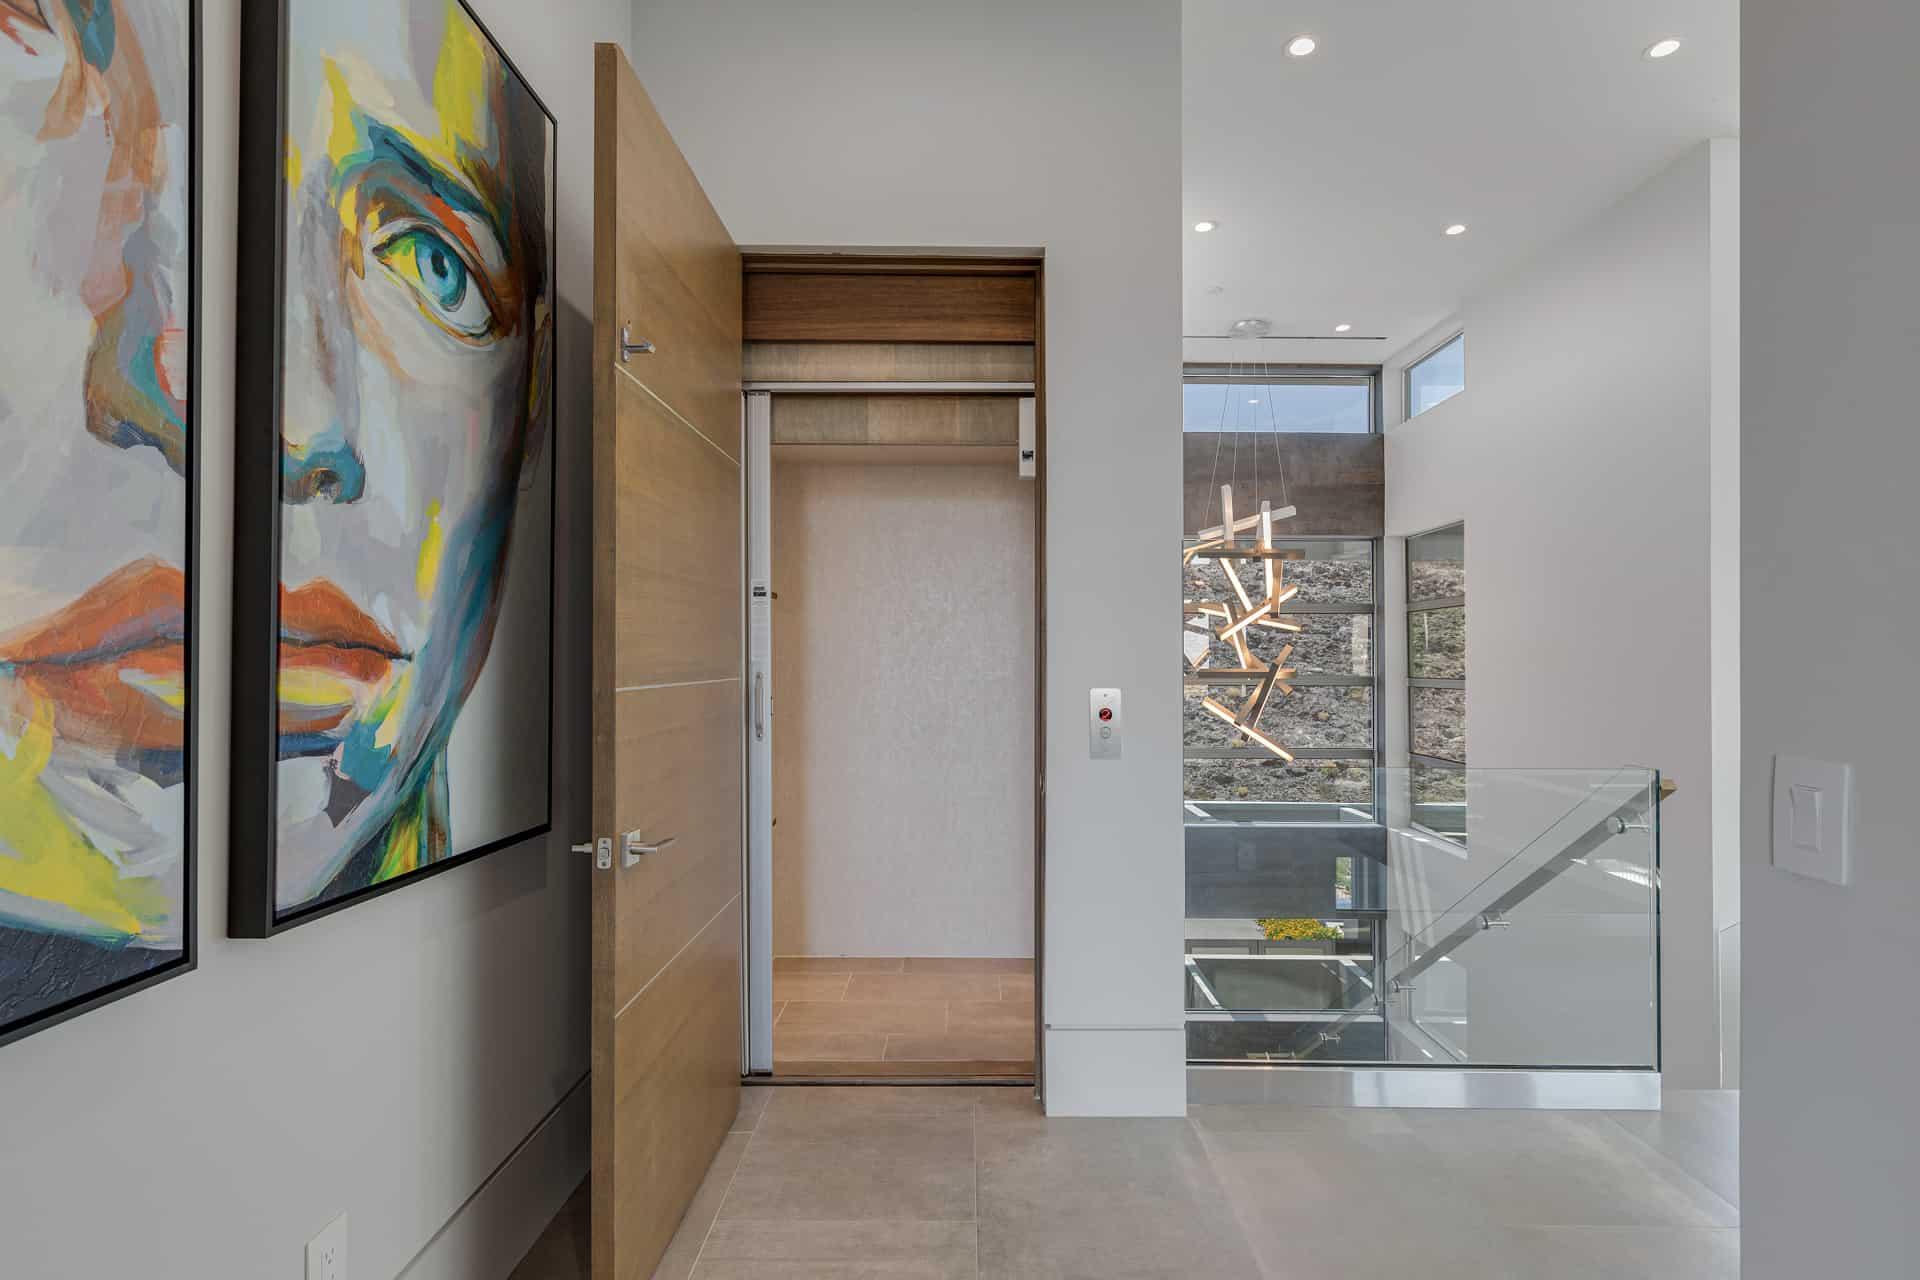 las-vegas-luxry-real-estate-realtor-rob-jensen-company-5-rockstream-drive-ascaya060